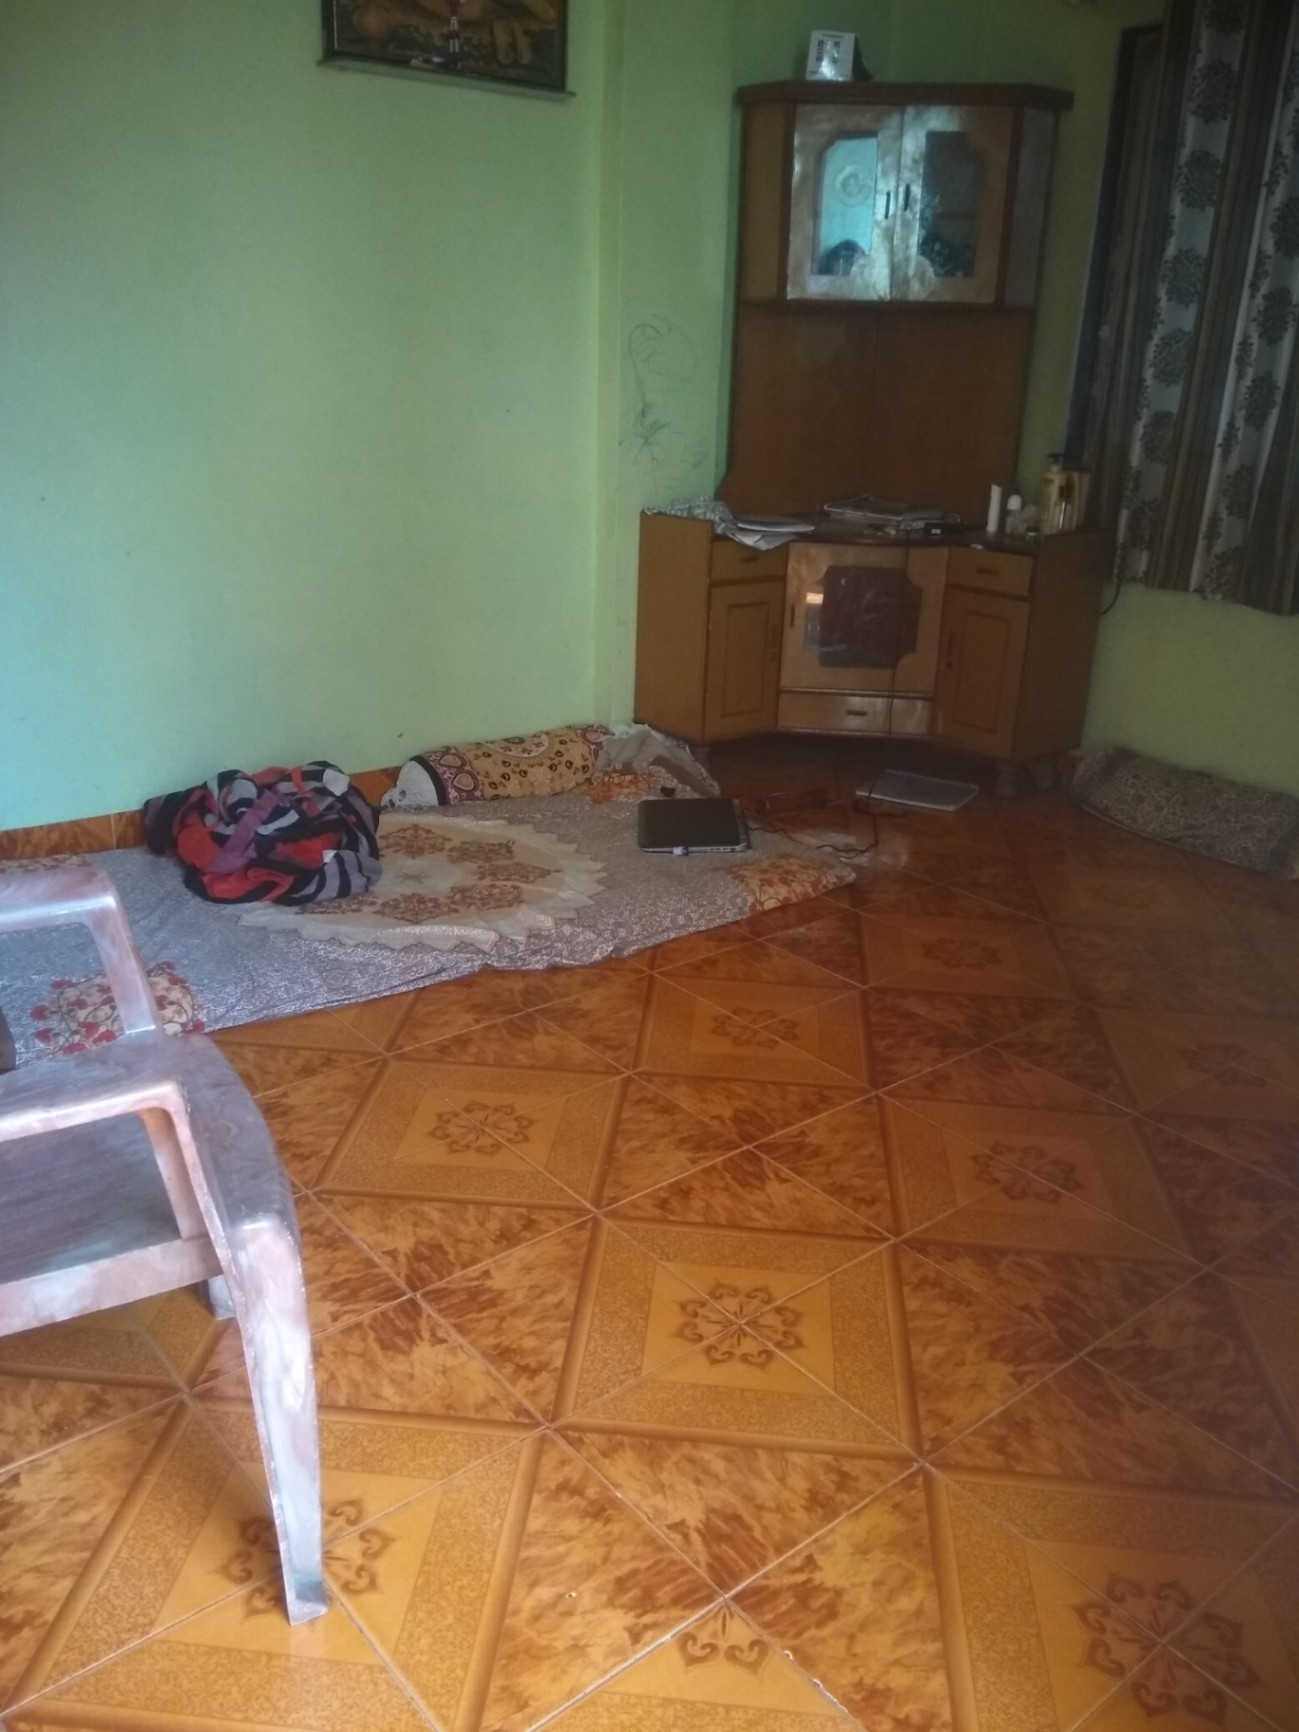 https://s3.ap-south-1.amazonaws.com/fmr.media.public/xnnua-1620729502914-37310